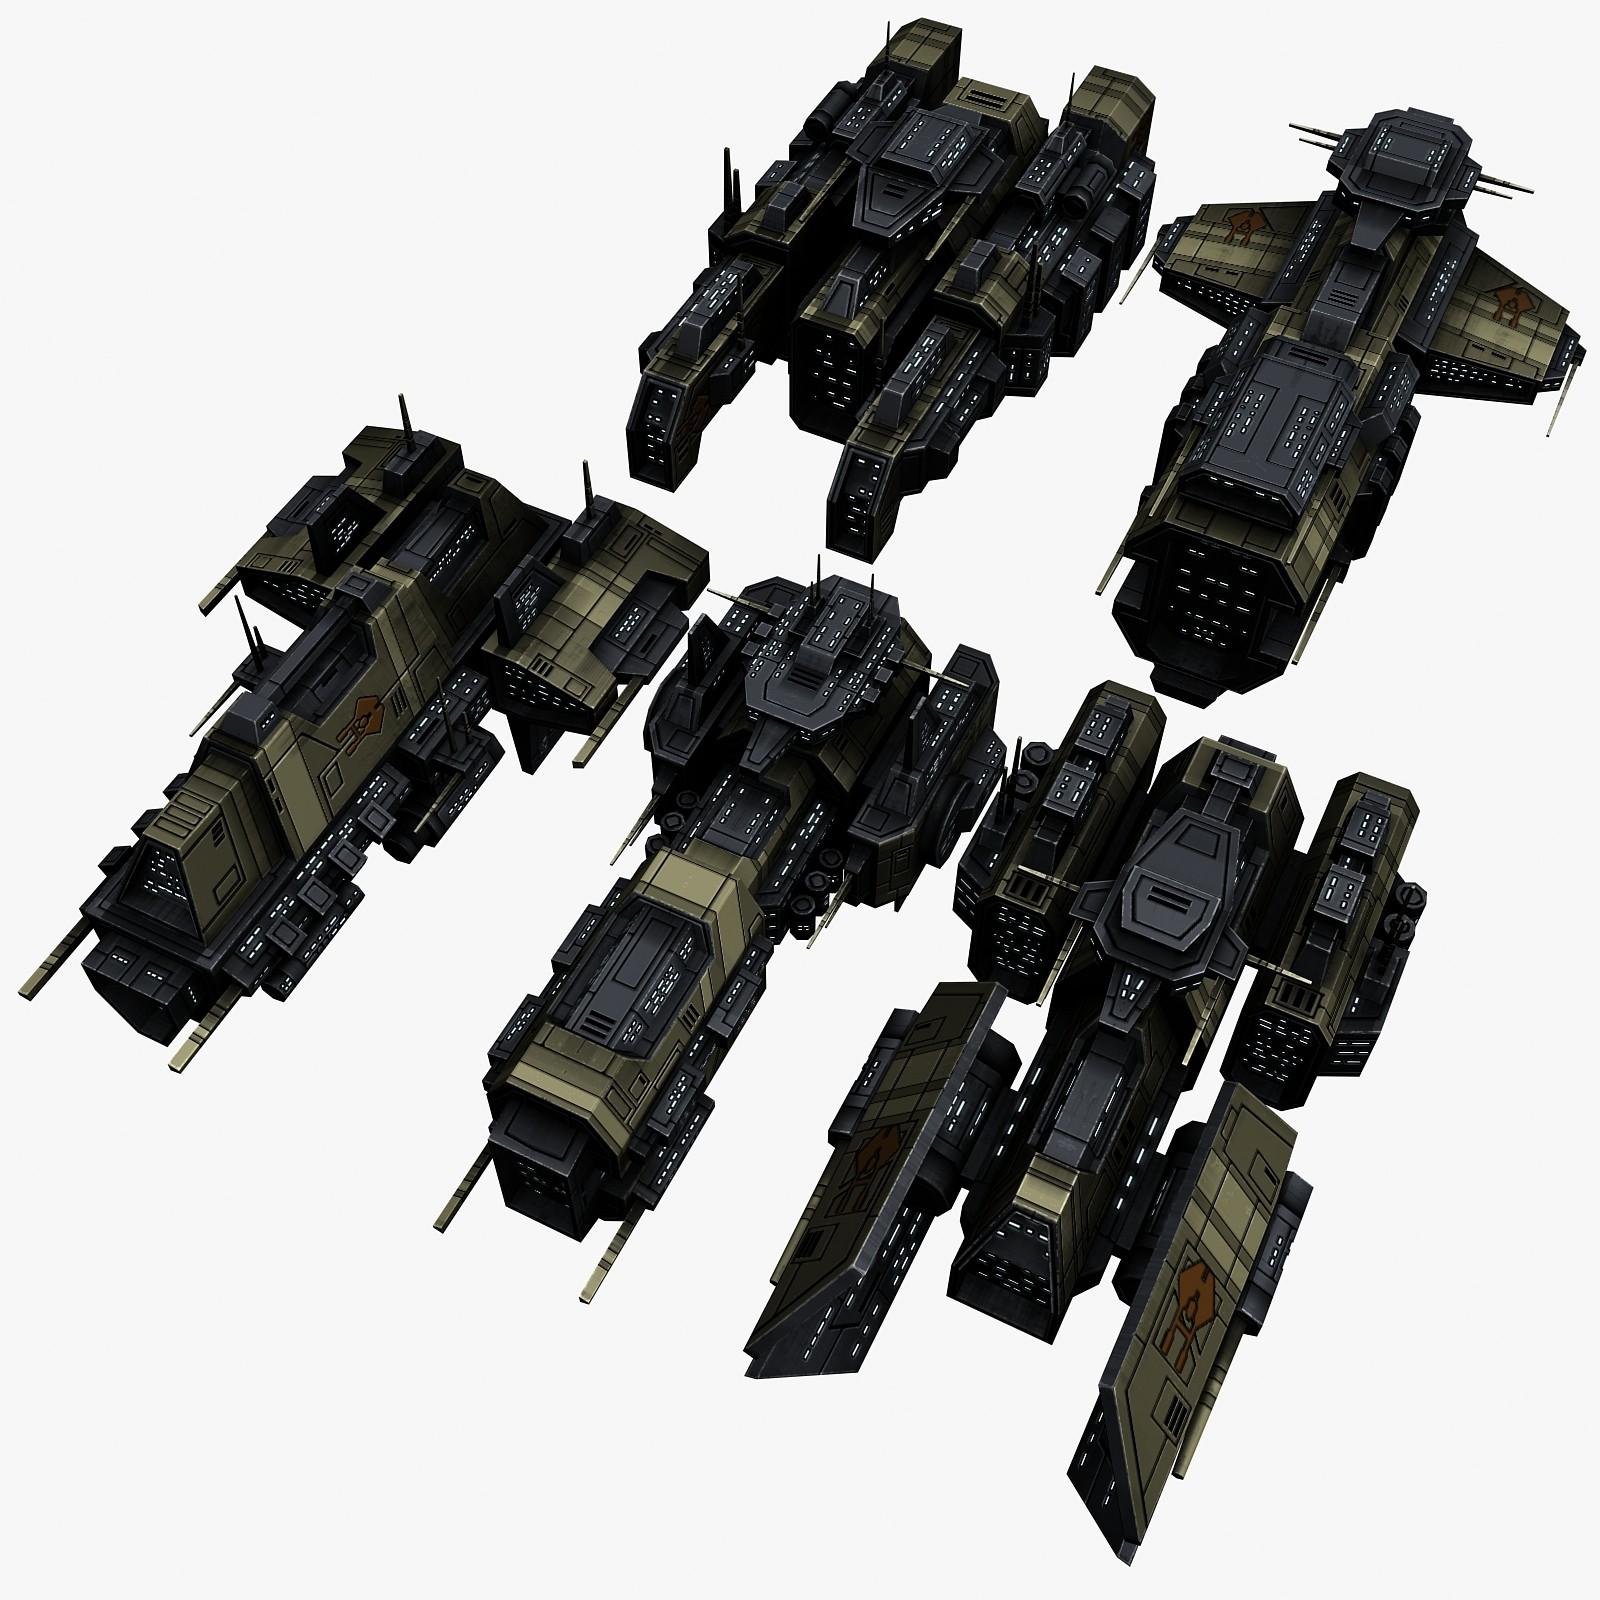 5 civilian transport spaceships 3d max